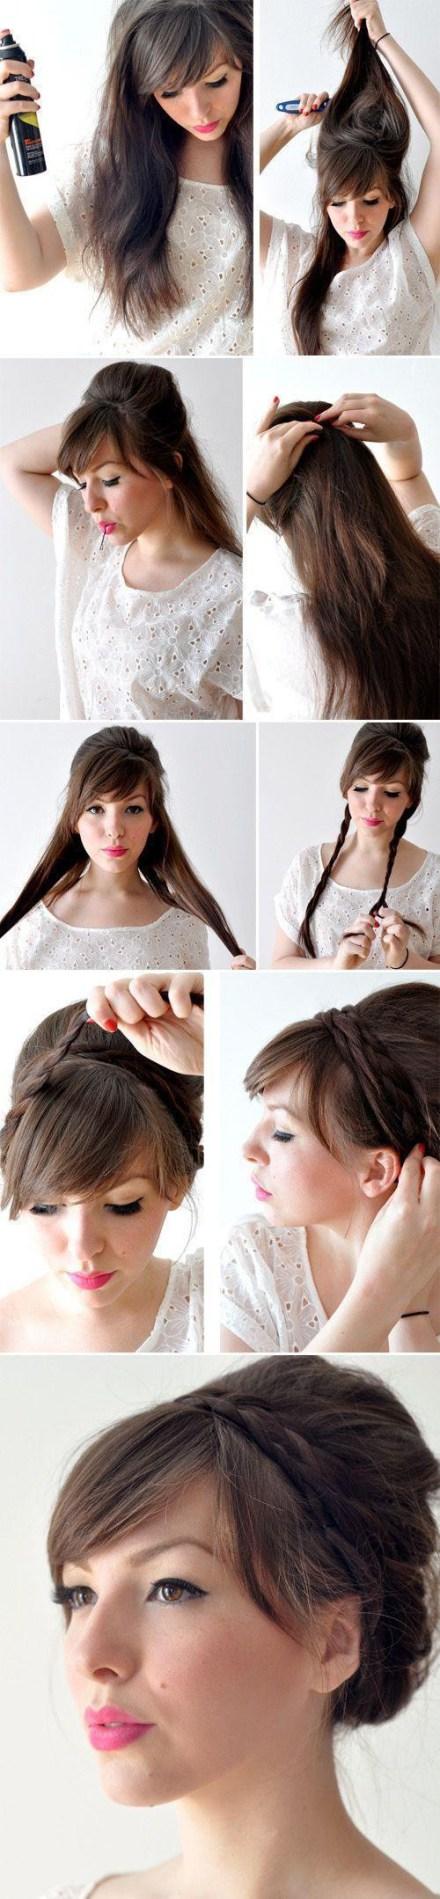 Diy de peinados vintage se animan hair style makeup and hair